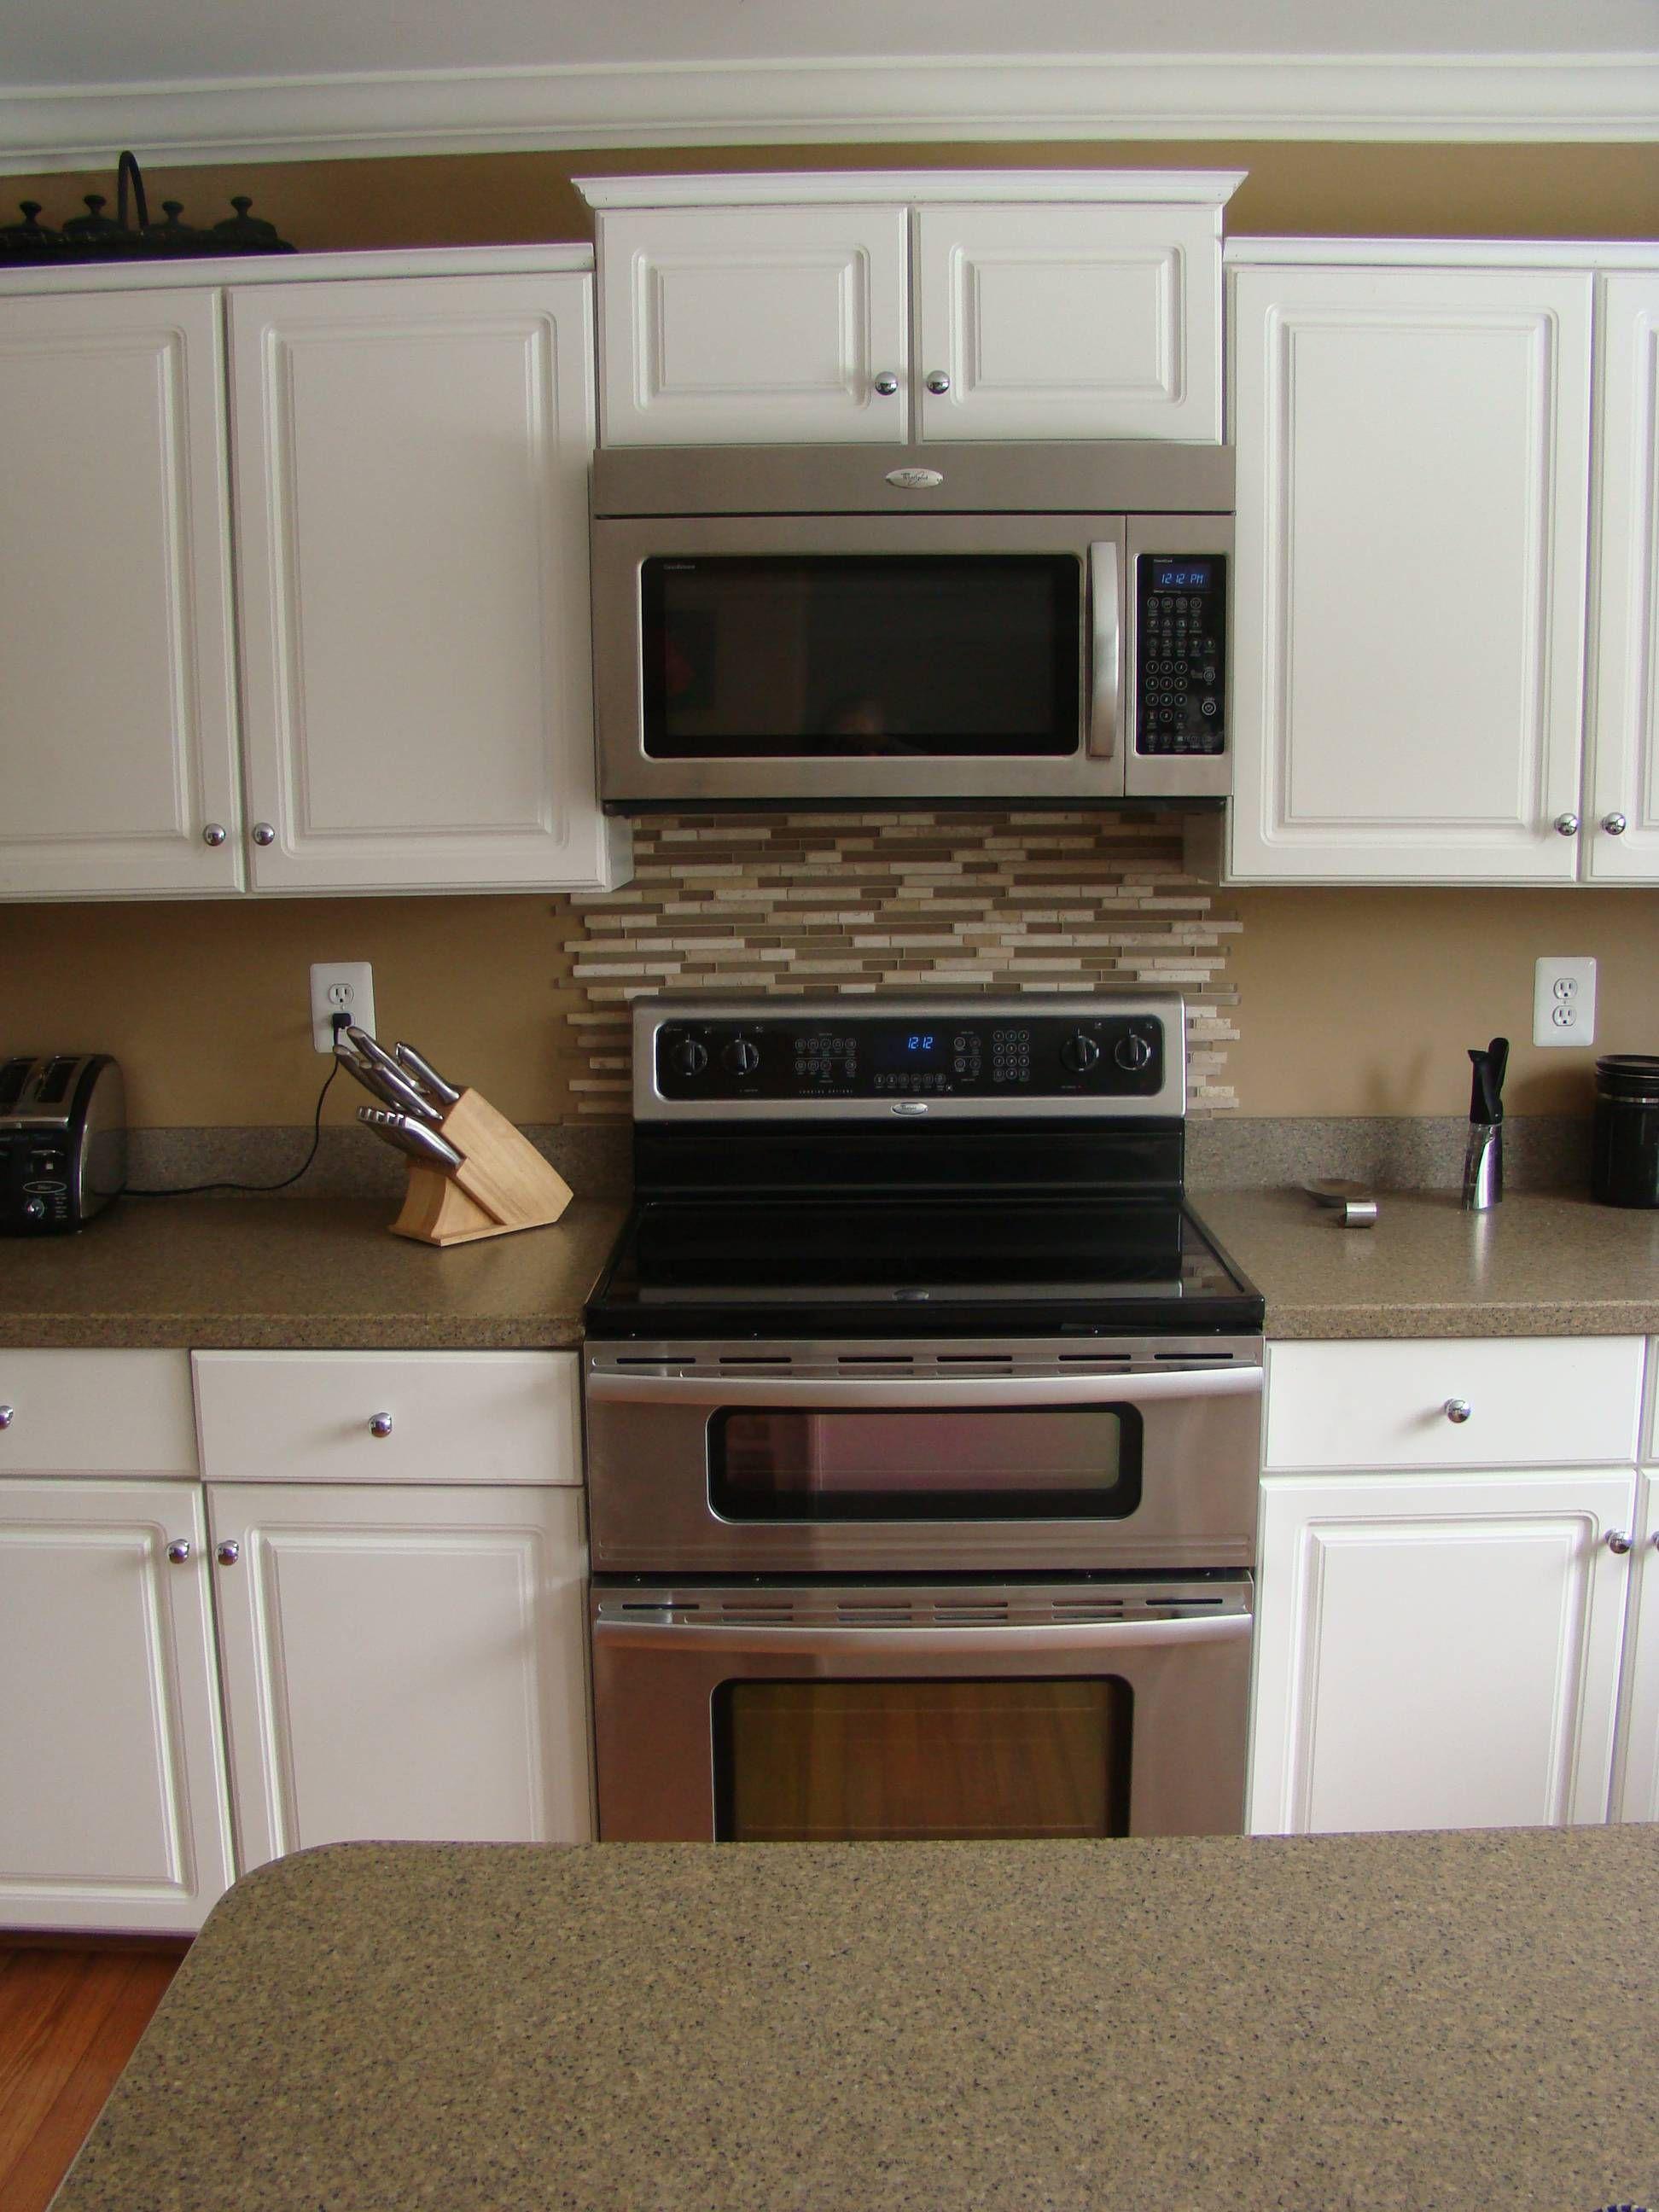 Kitchen Sink Backsplash Designs White Cabinets Doors Paint